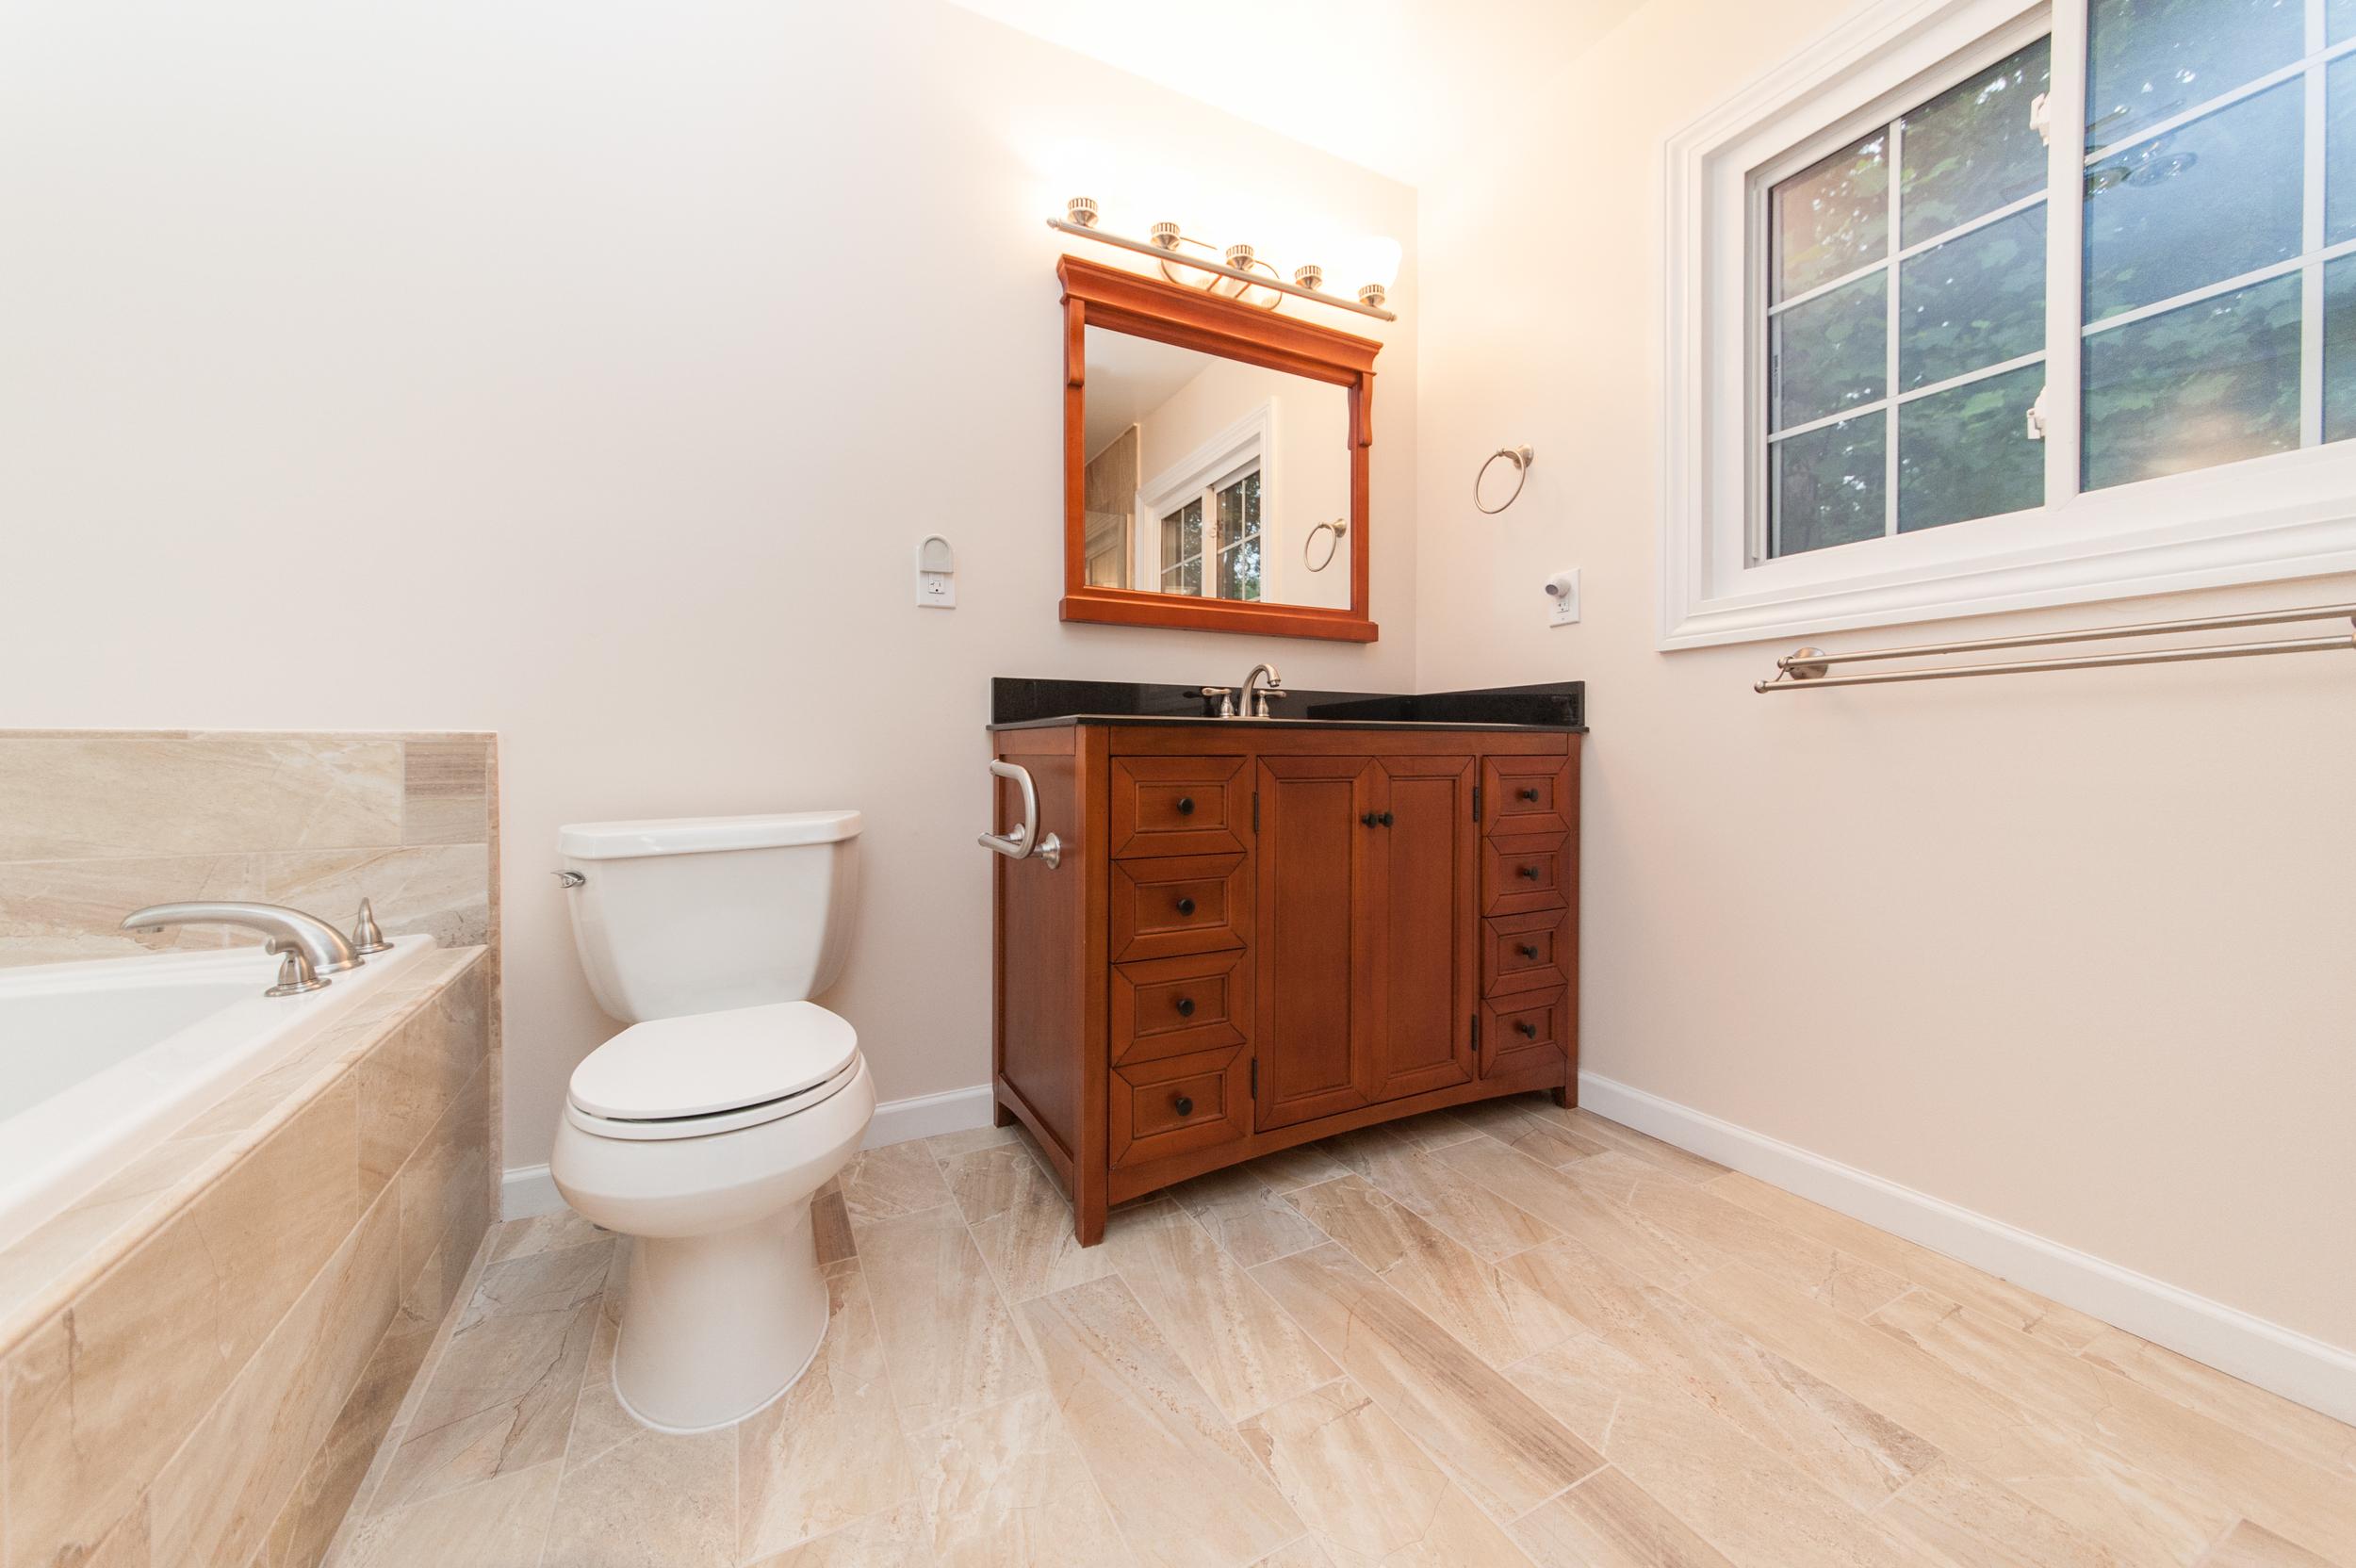 Bathroom Renovation Clarksville, MD